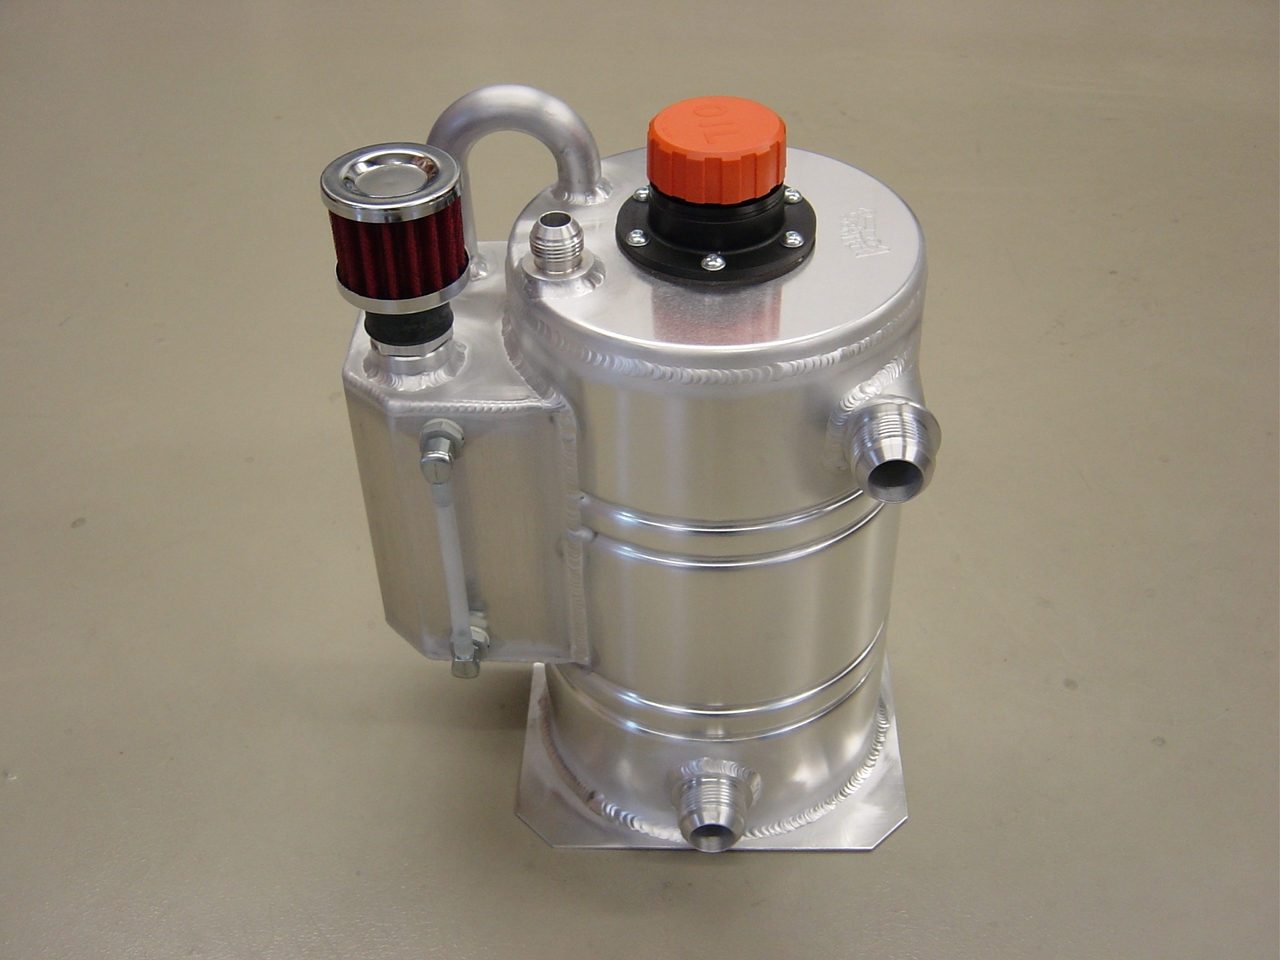 Dry-sump tank 8 liter speciaal - R - Dash 16-0